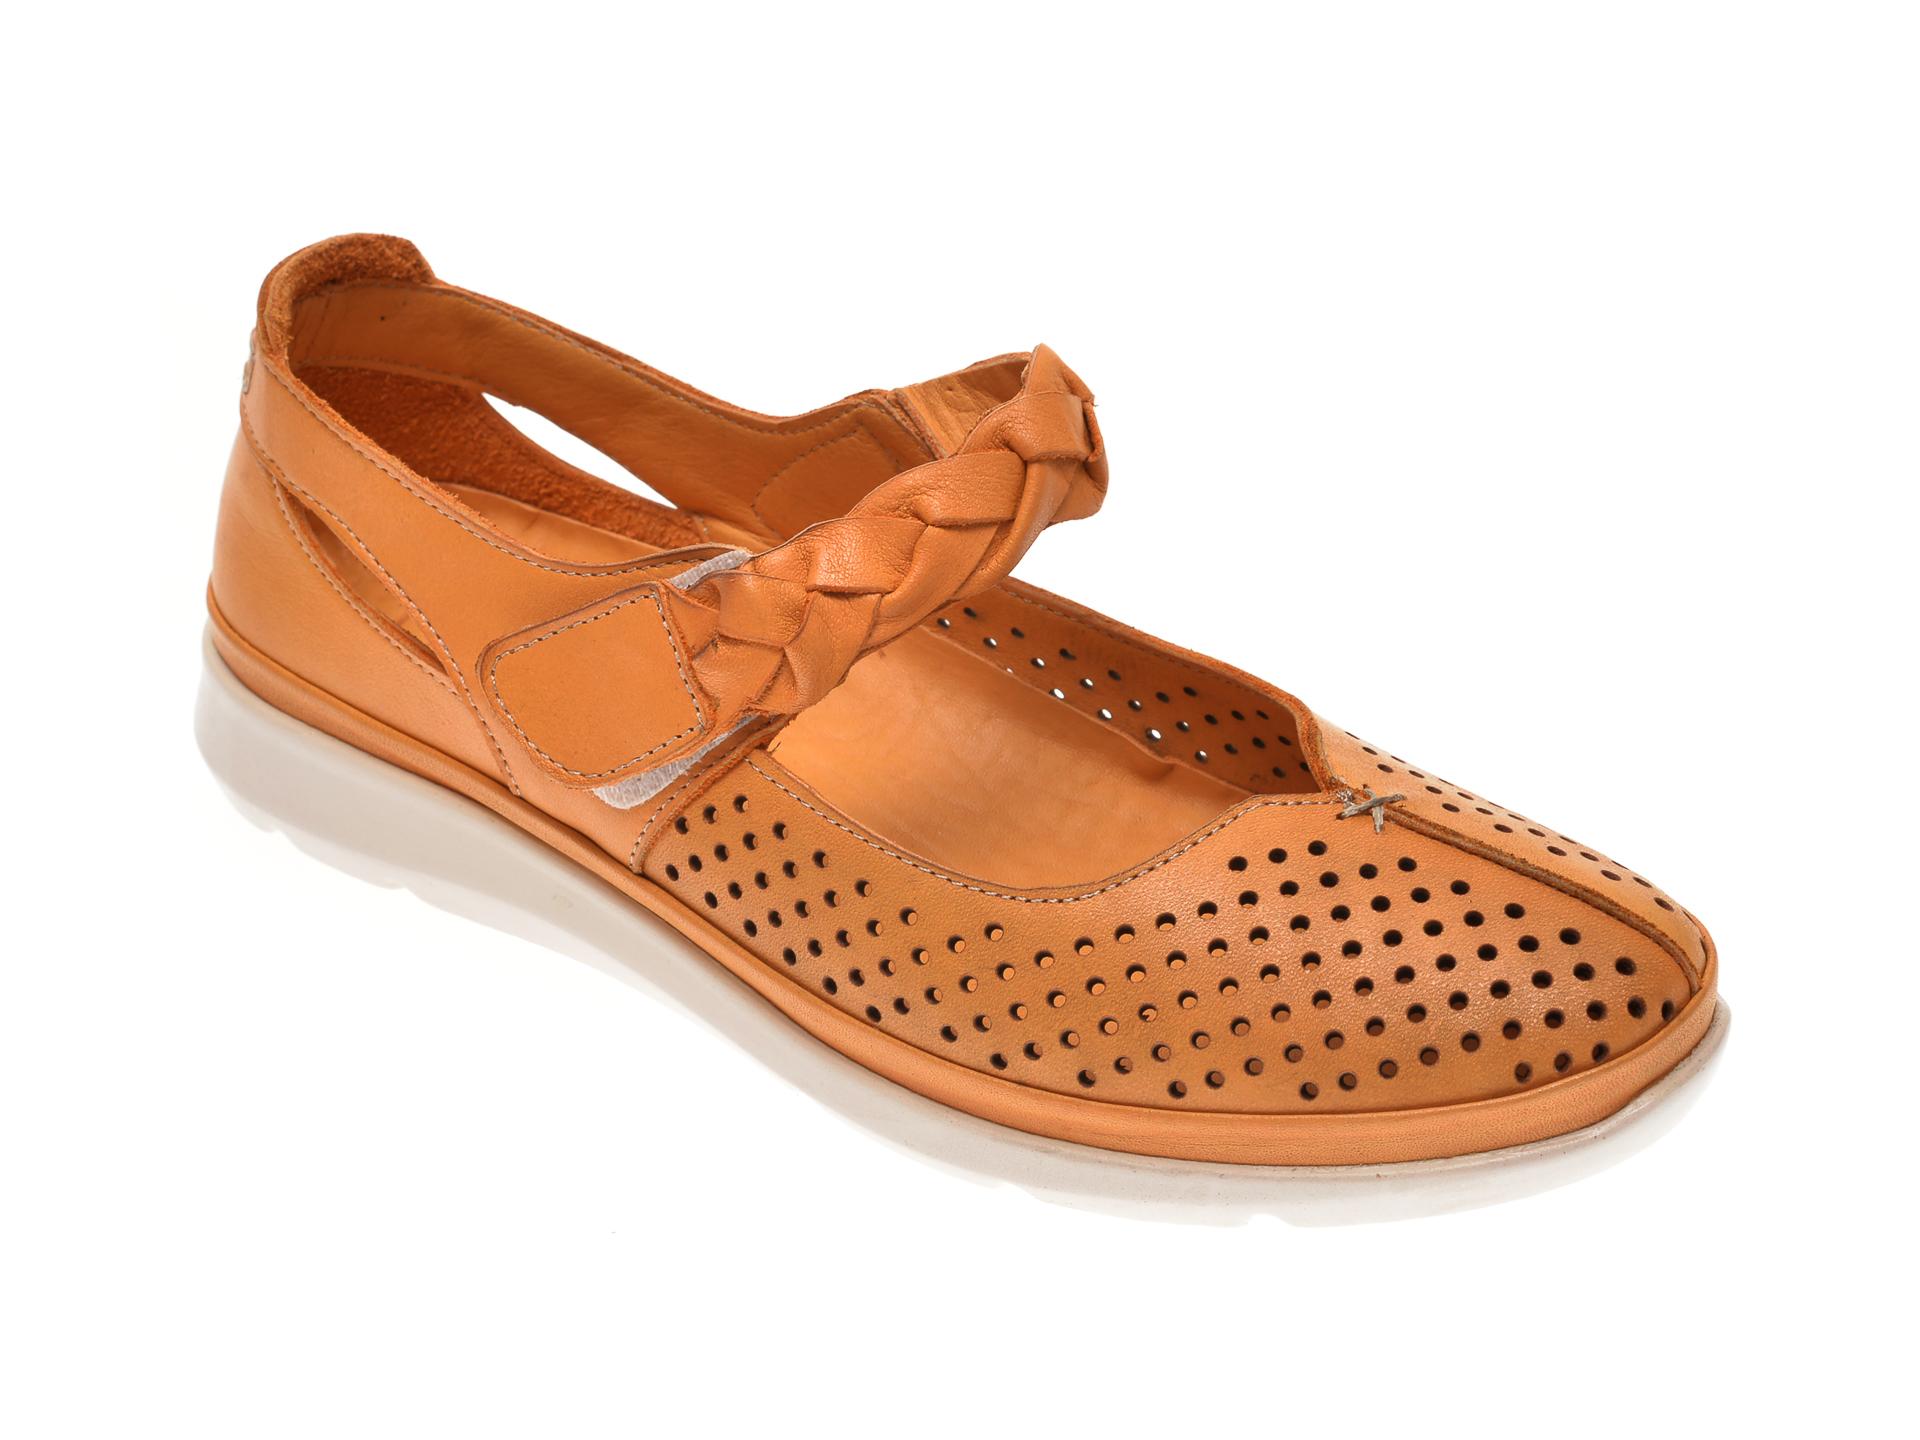 Pantofi X TREND galbeni, 608, din piele naturala